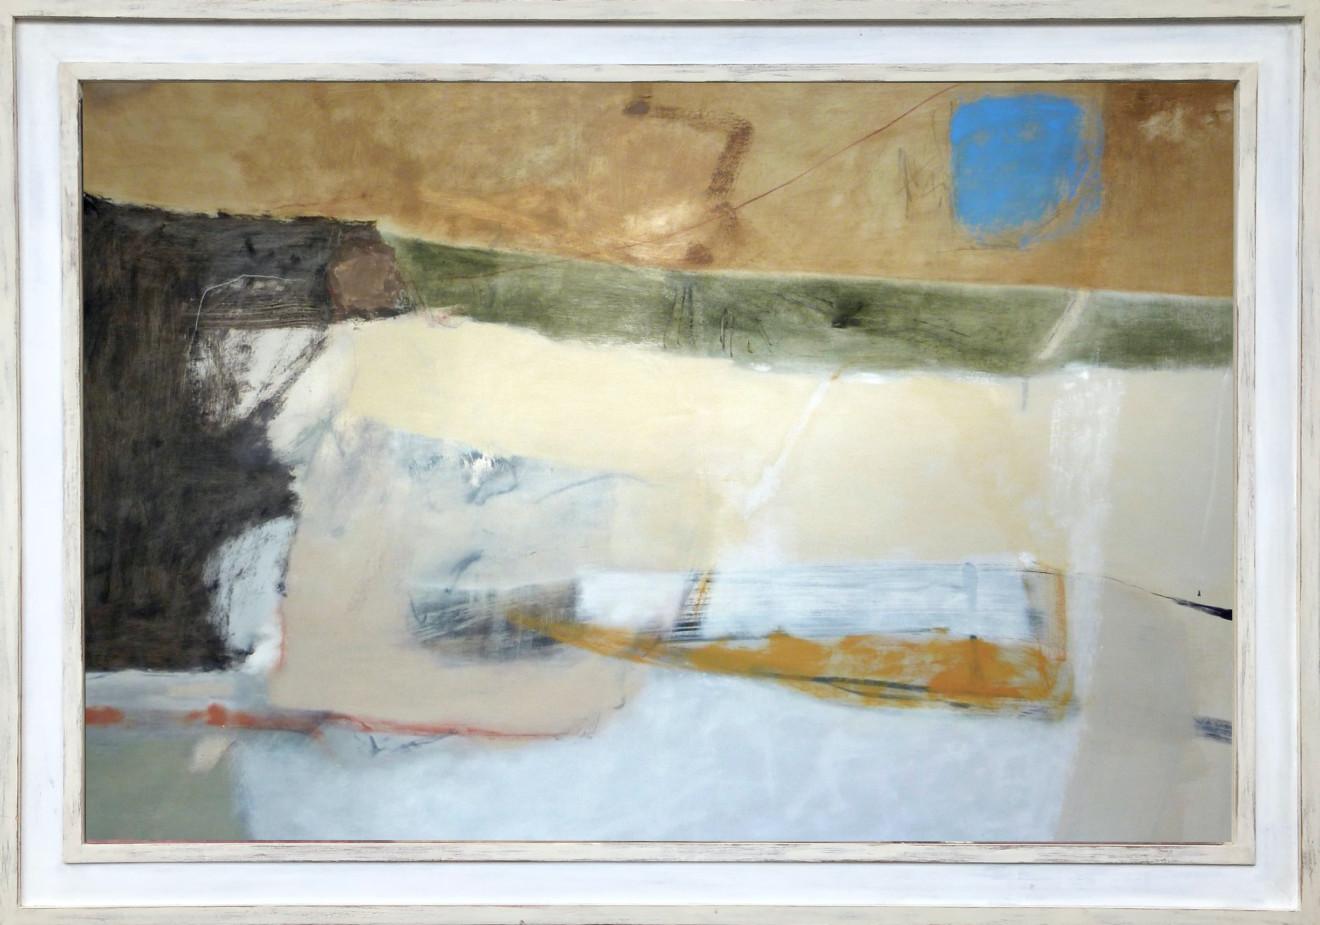 Dooze Storey, The Bluff (London Gallery)